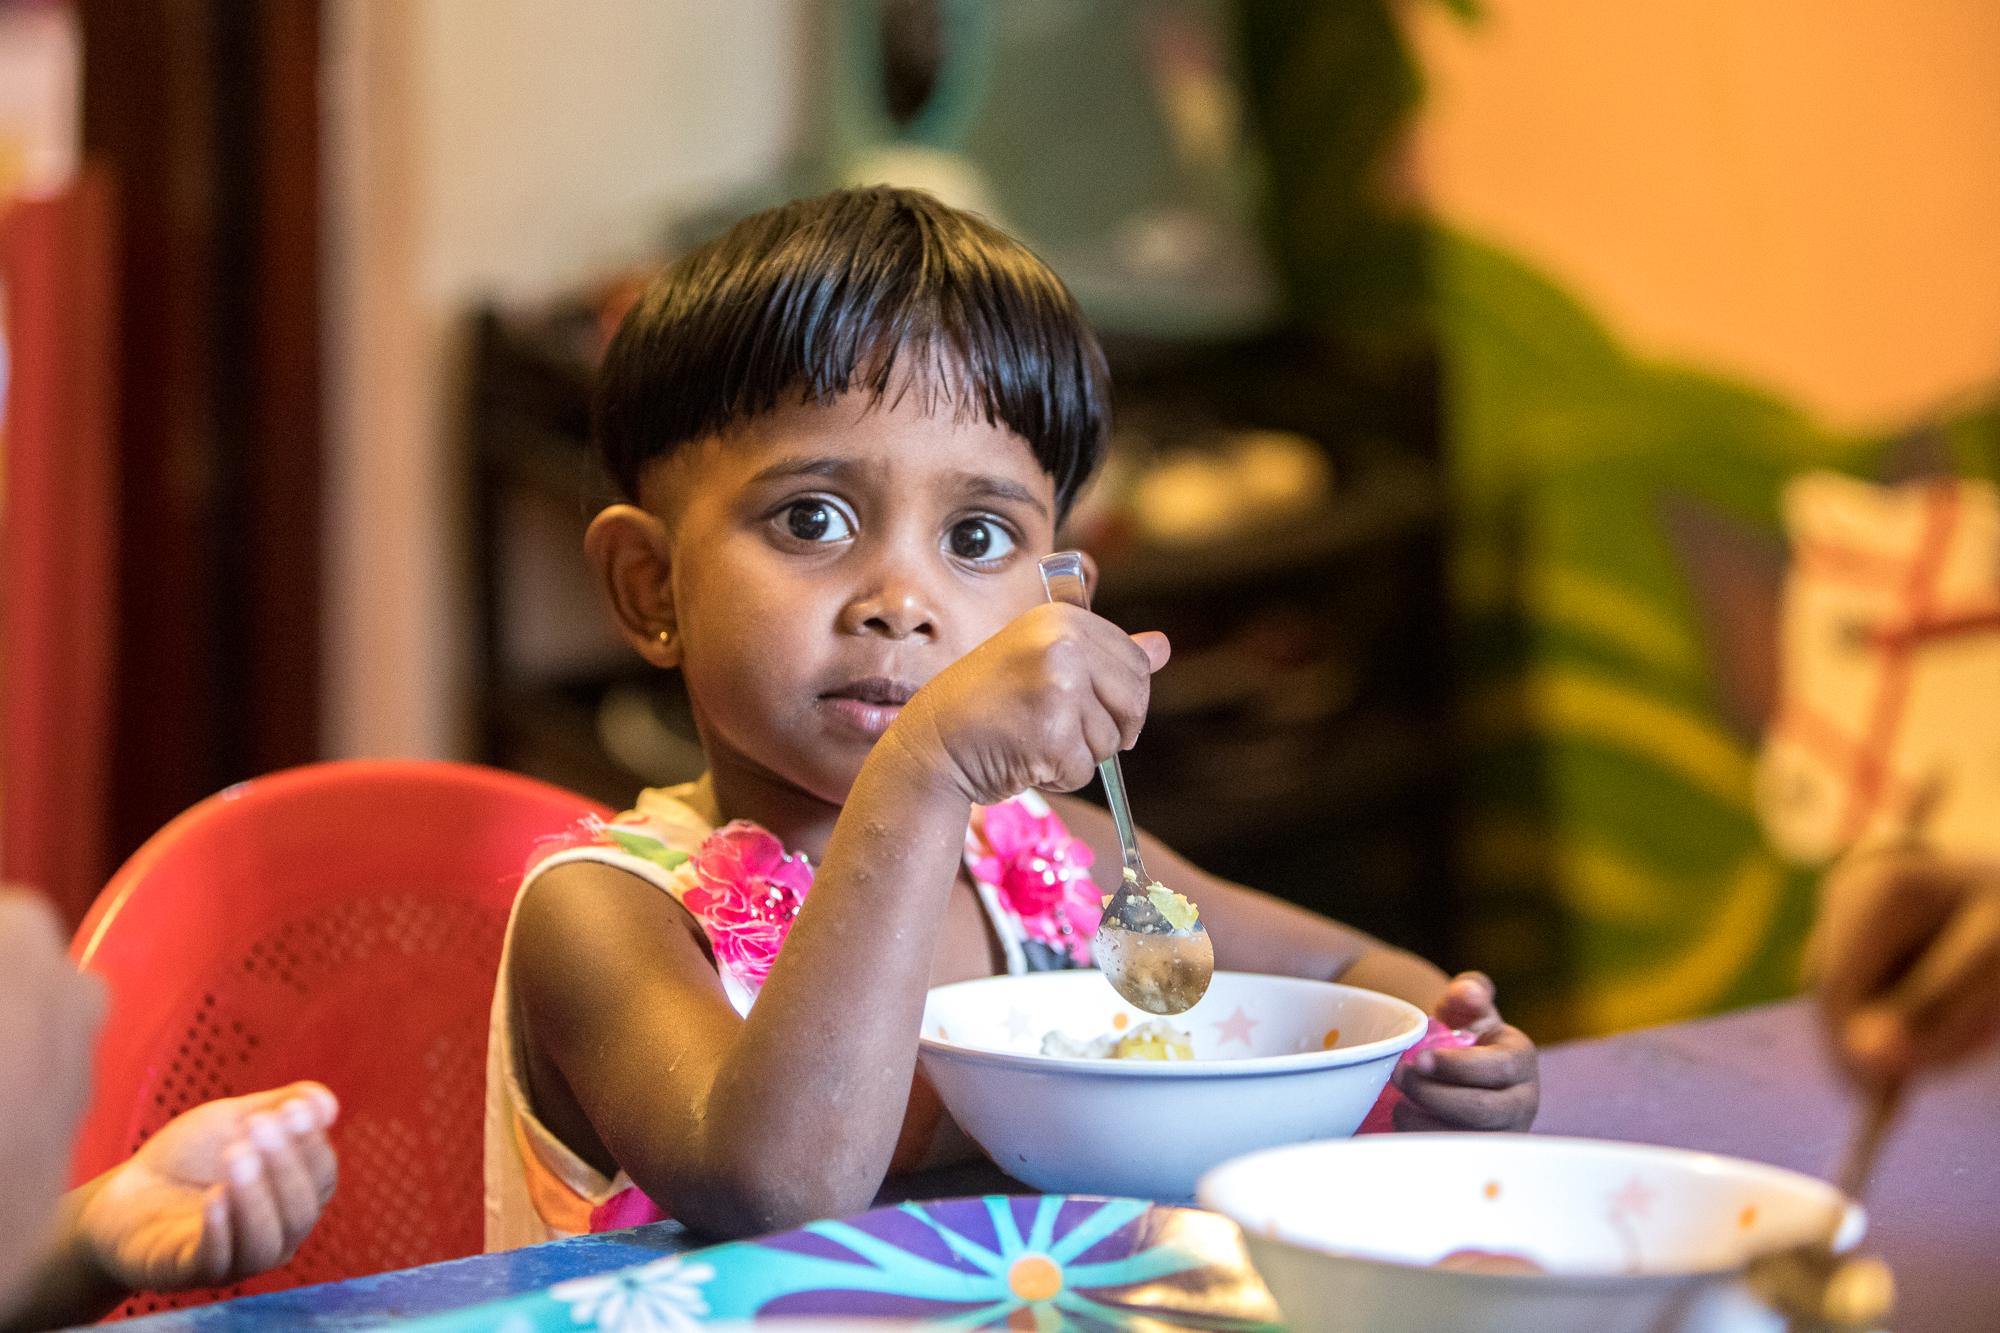 Adam Dickens 2017 - Child Action Lanka, Sri Lanka 1432.jpg